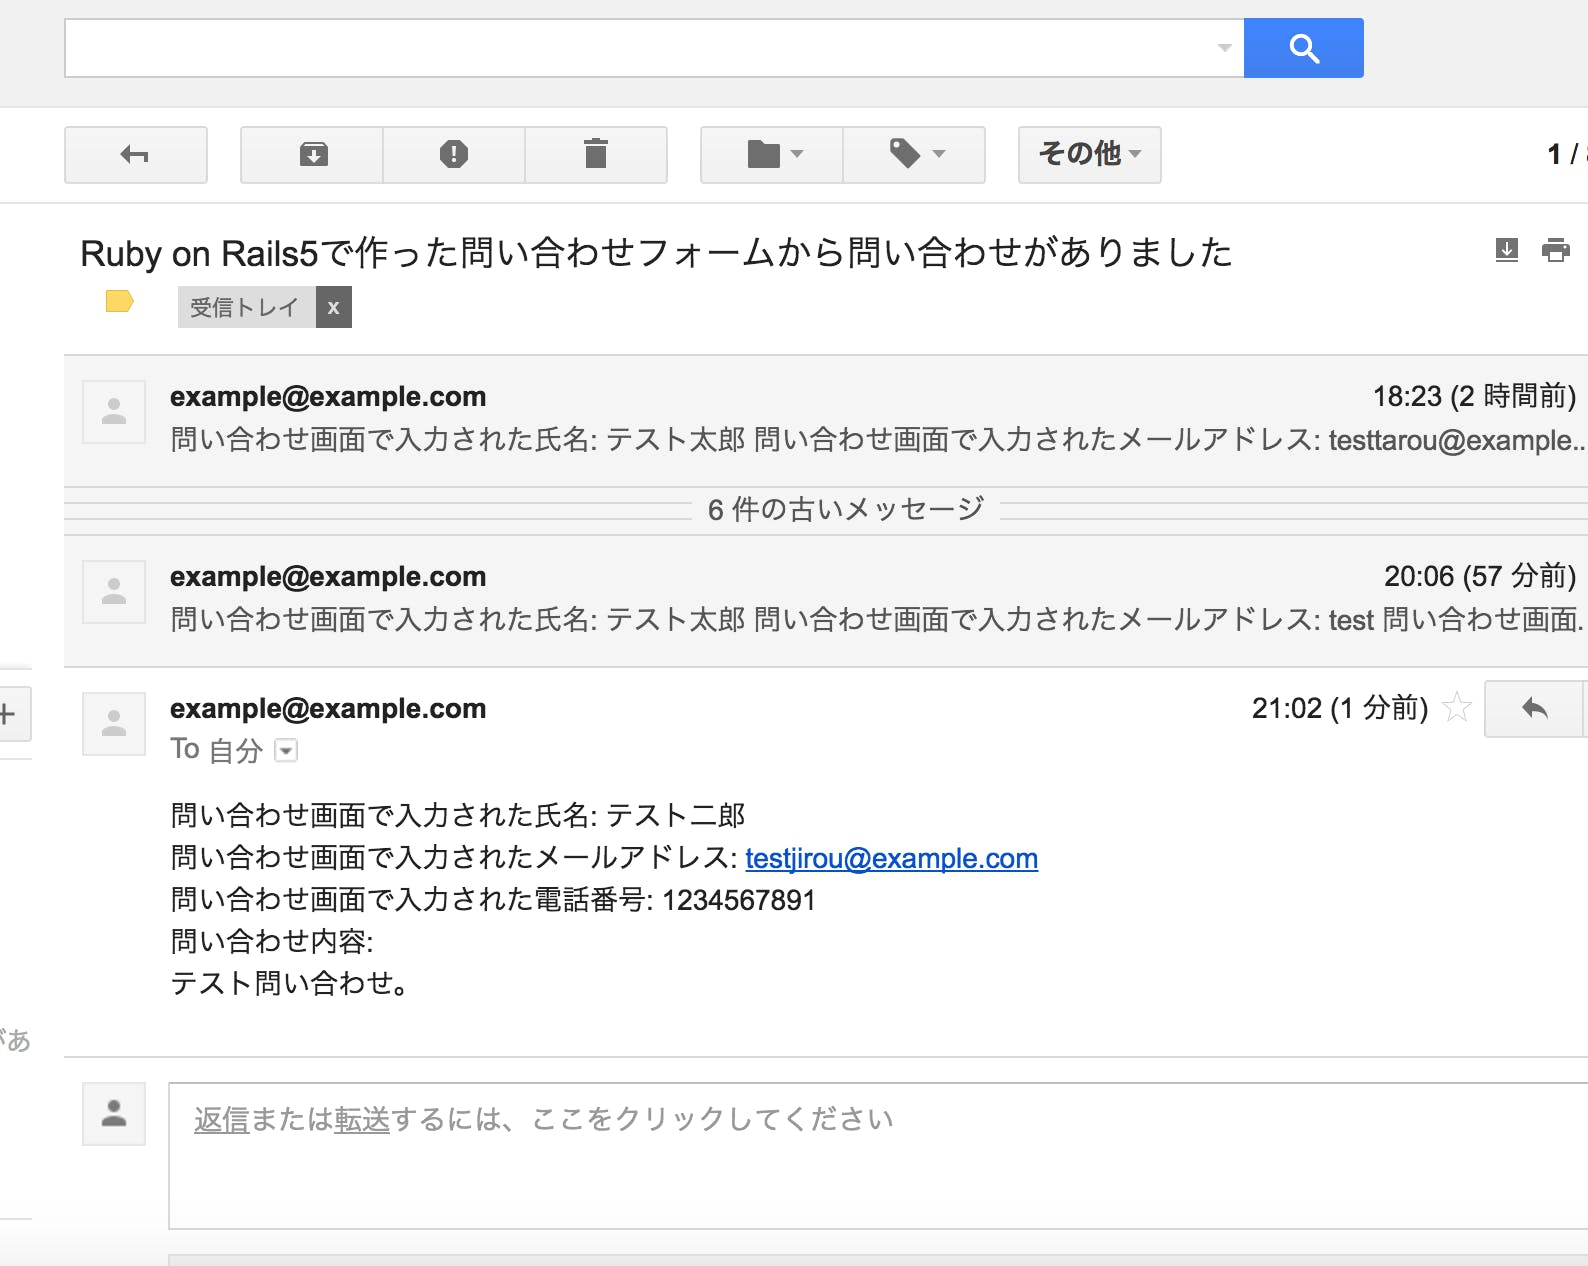 Ruby on Rails 5 で問い合わせフォーム作成 (問い合わせ内容を